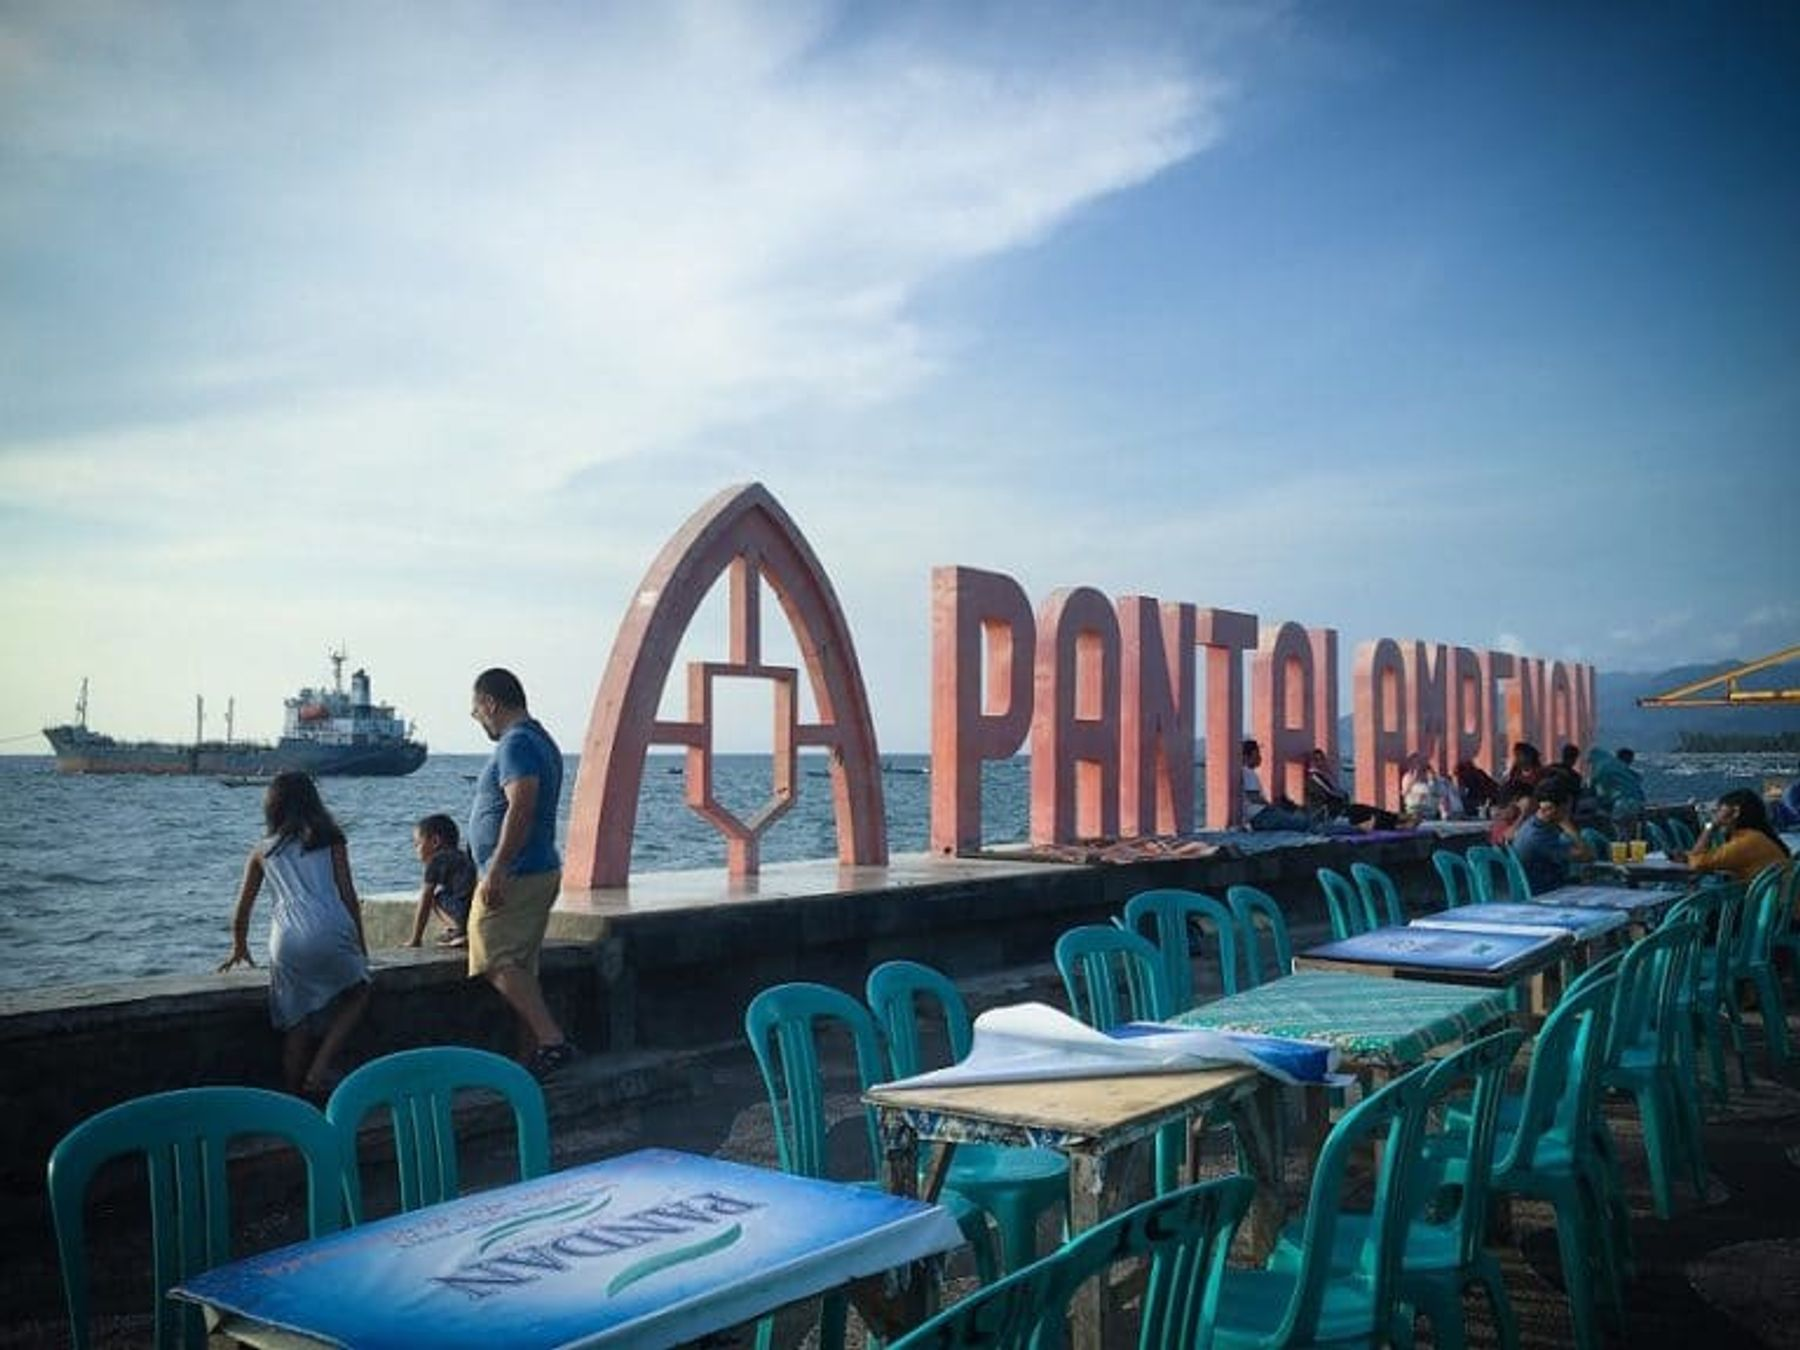 Restaurants along Pantai Ampenan near Mataram, Indonesia (November 2019)